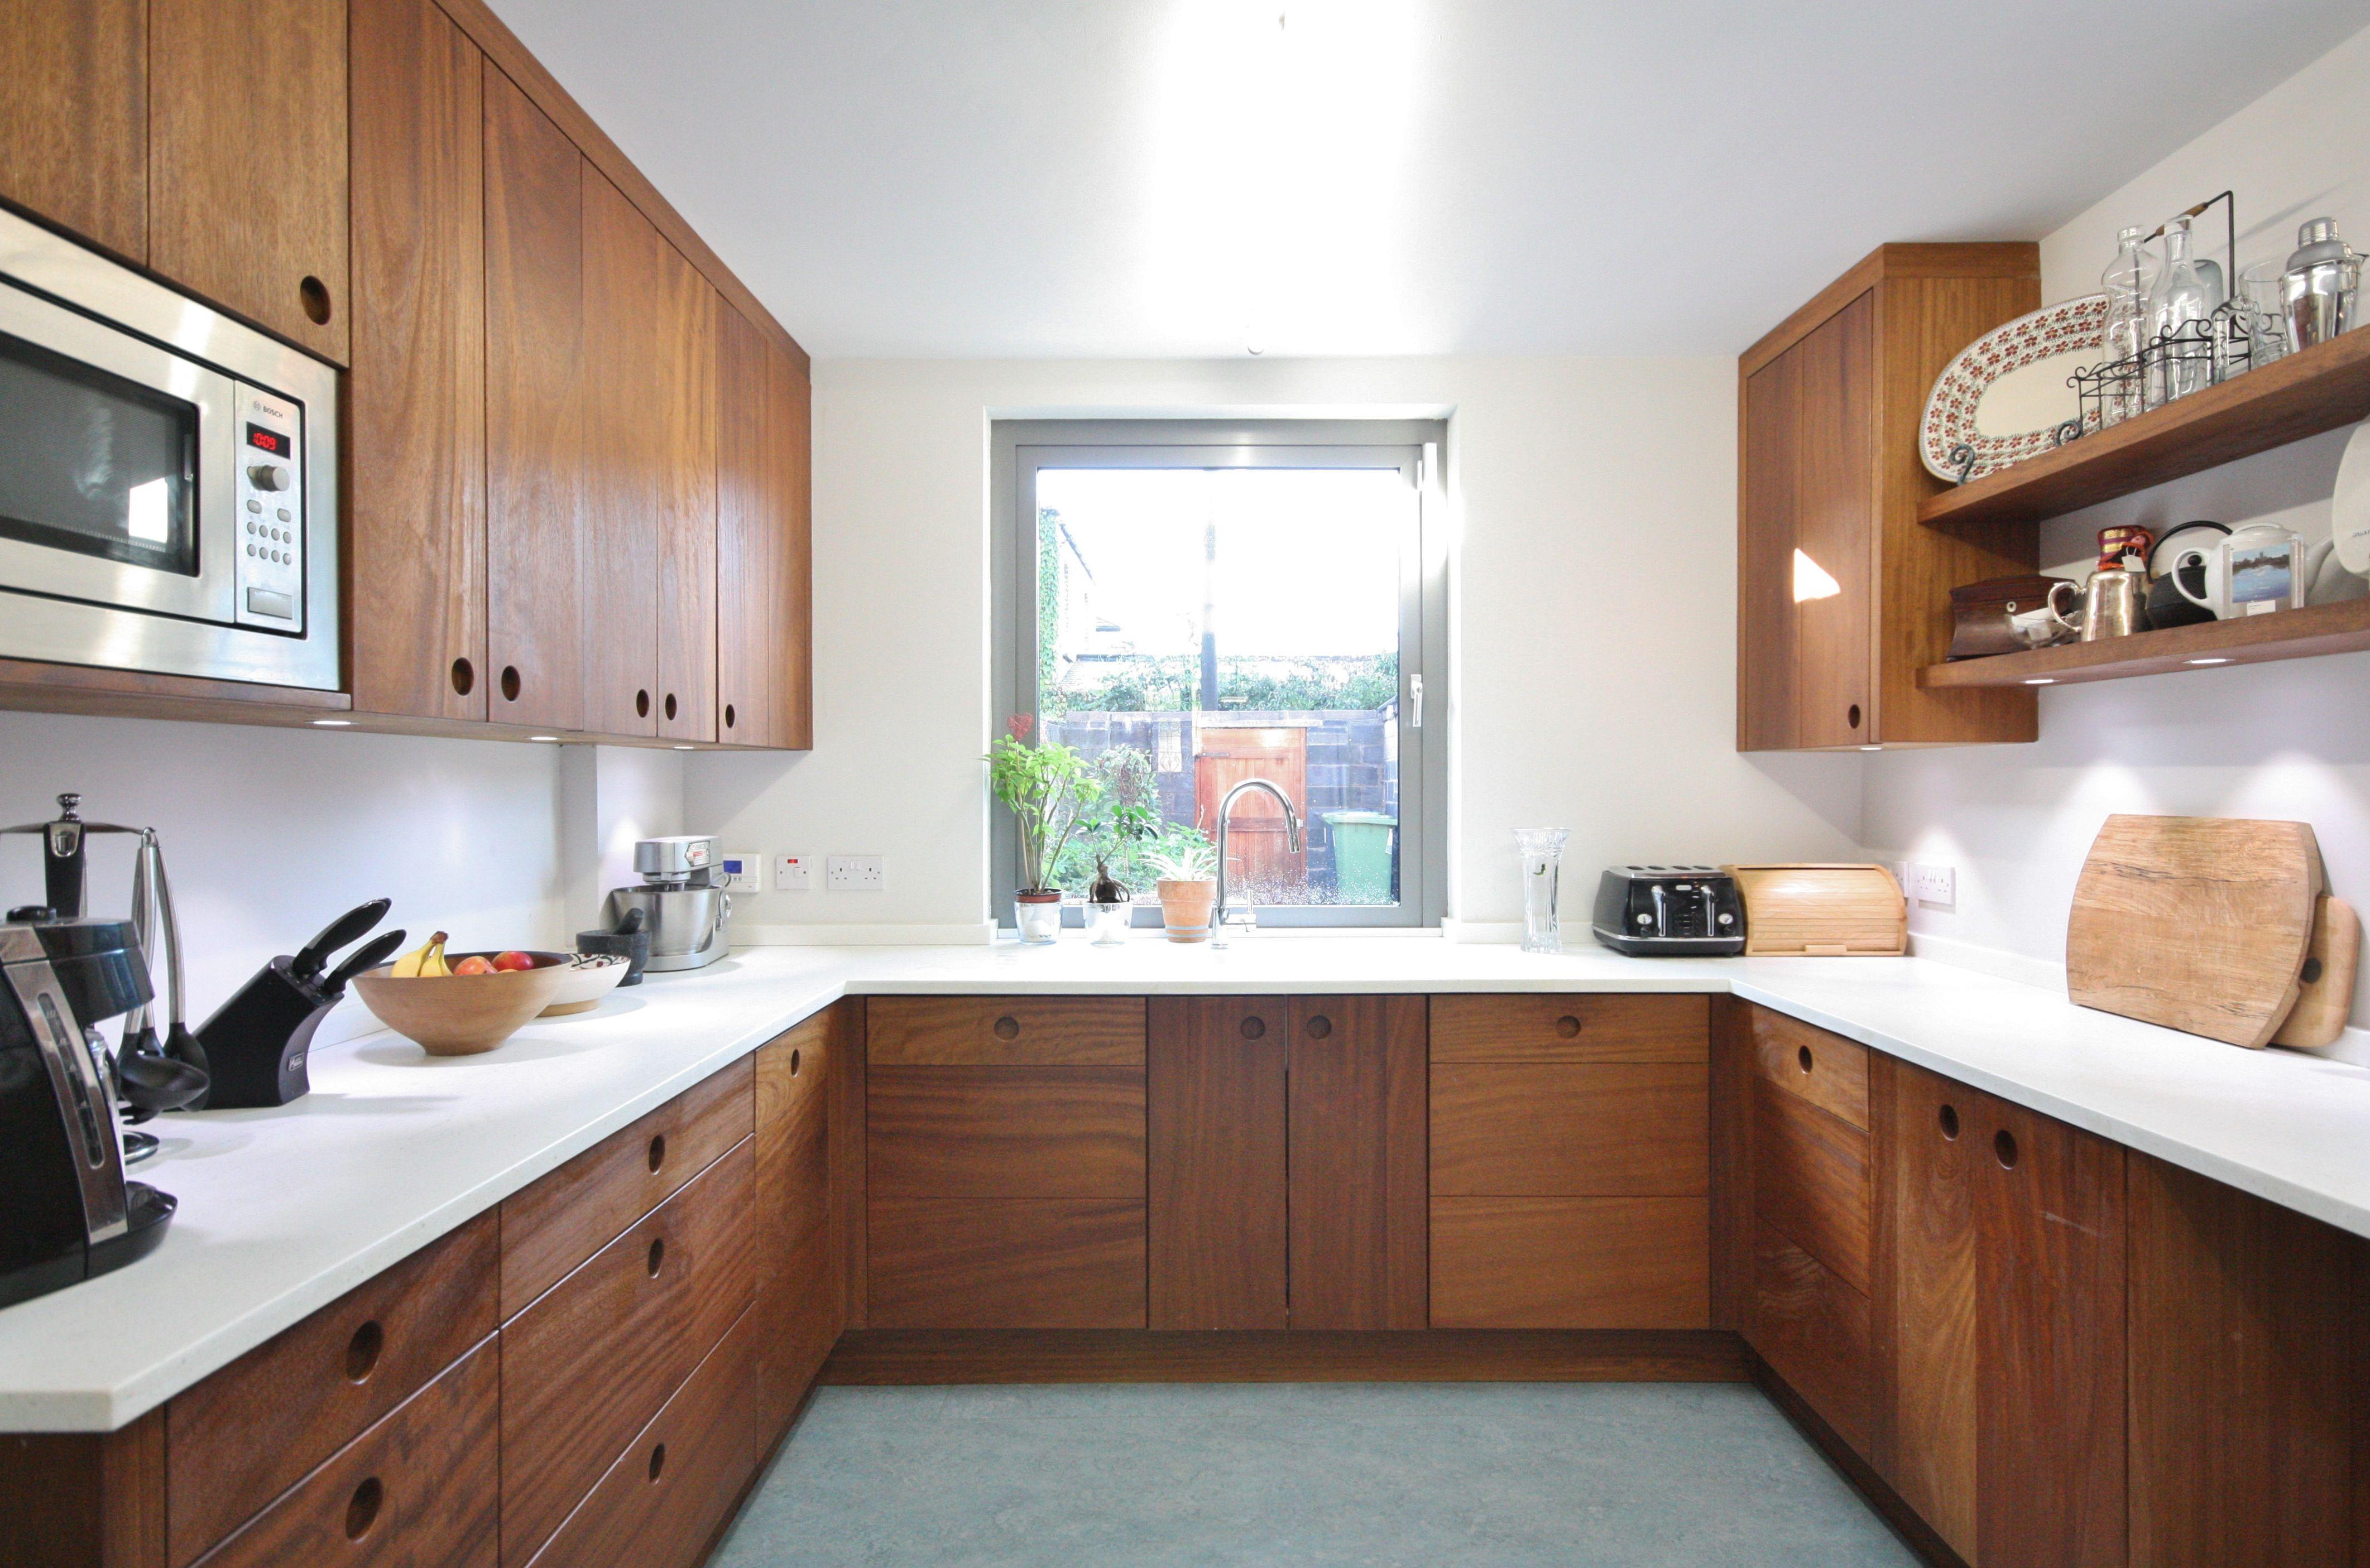 Bespoke Iroko Kitchen Terenure Enigma Design 4a Modern Retro Kitchen Kitchen Interior Asian Interior